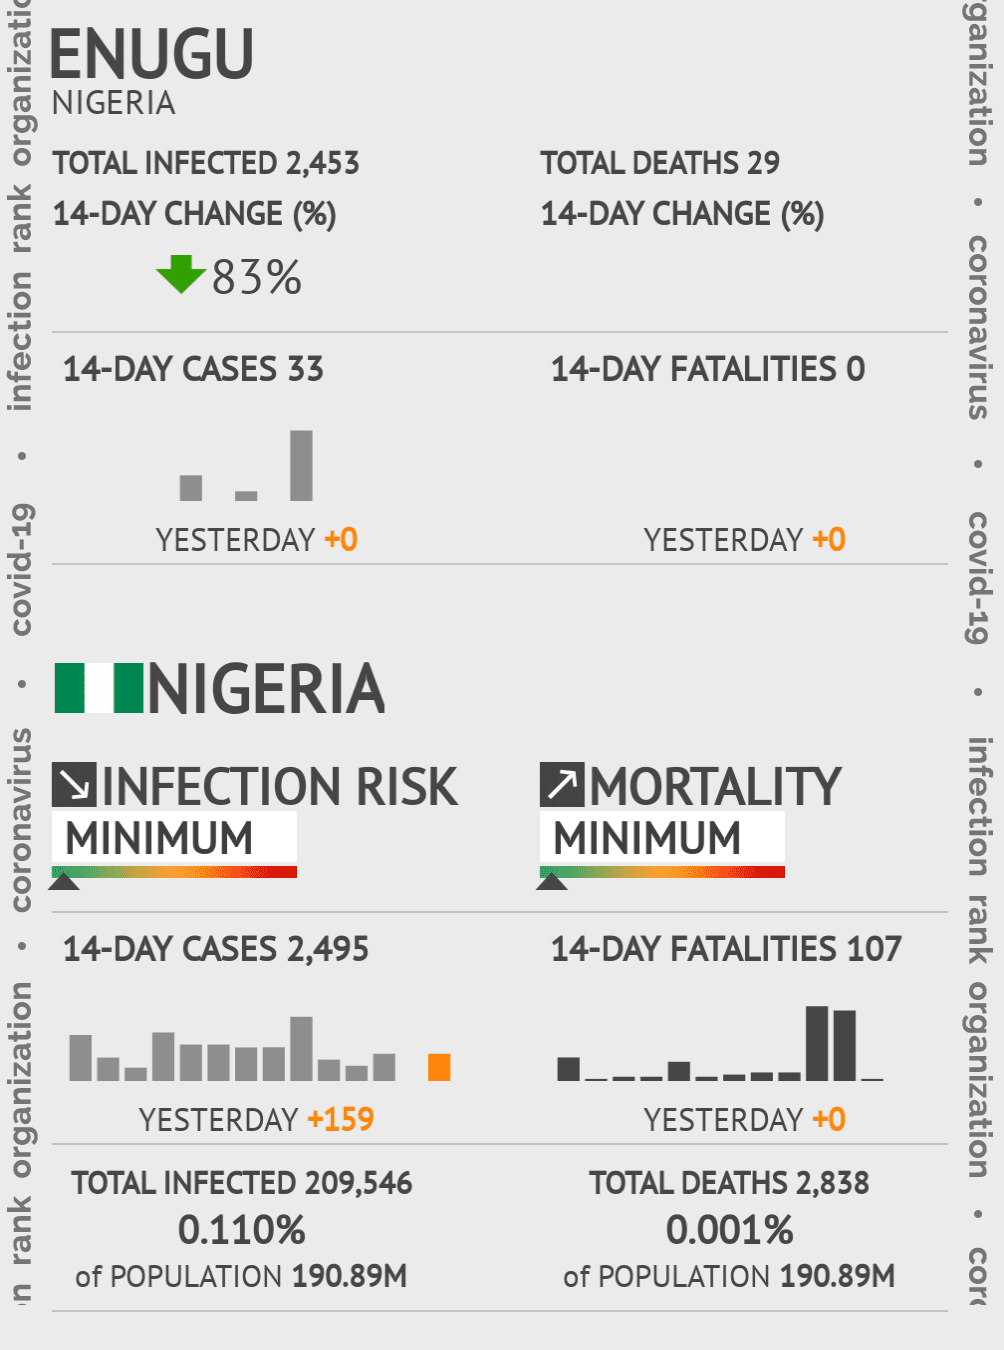 Enugu Coronavirus Covid-19 Risk of Infection on February 26, 2021